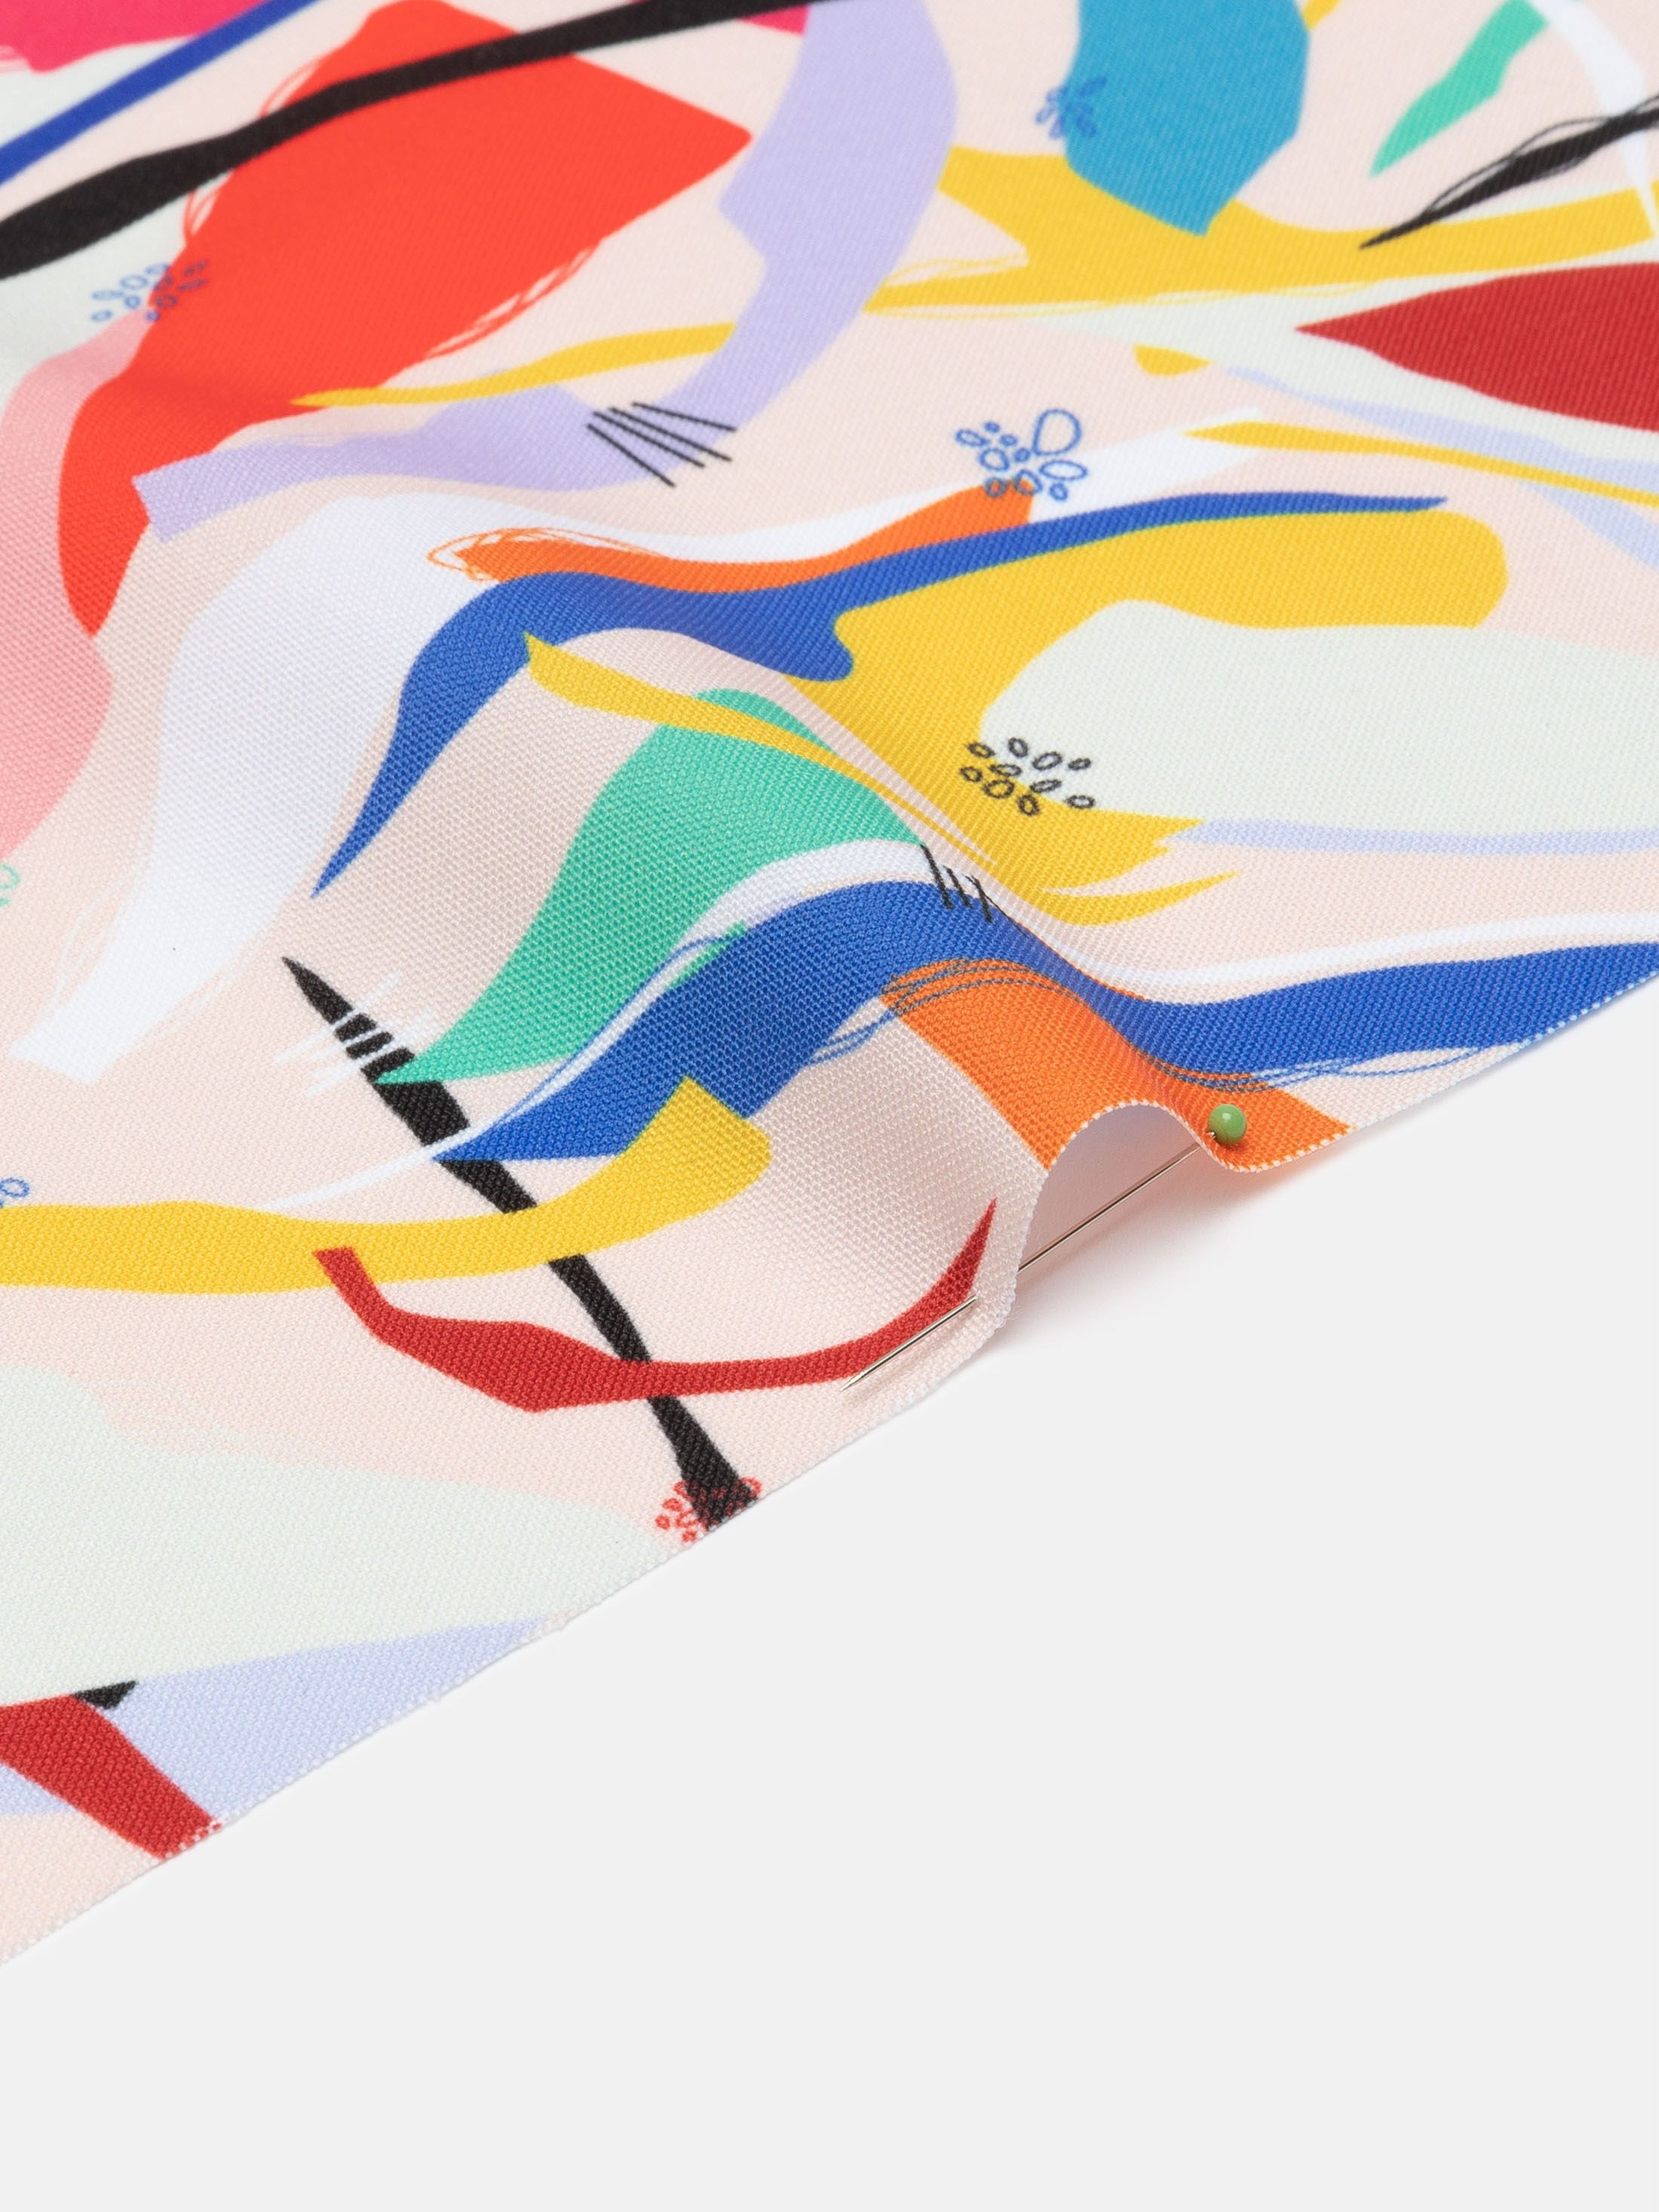 stampa digitale su tessuto cotone panama flo al metro